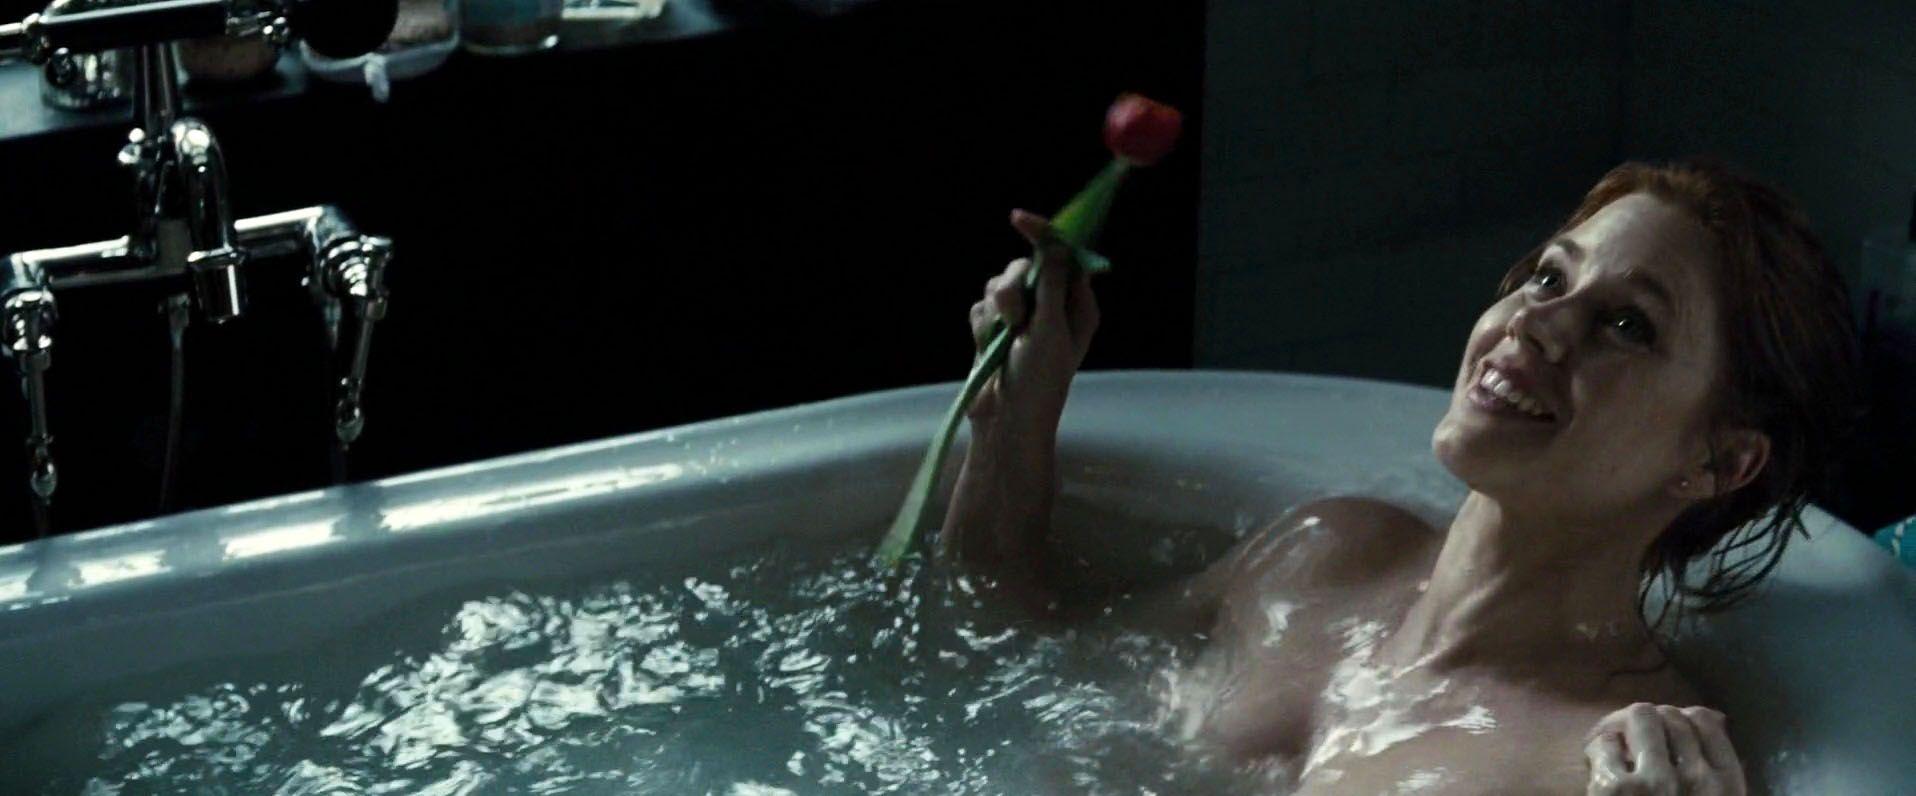 naked fakes adams Amy